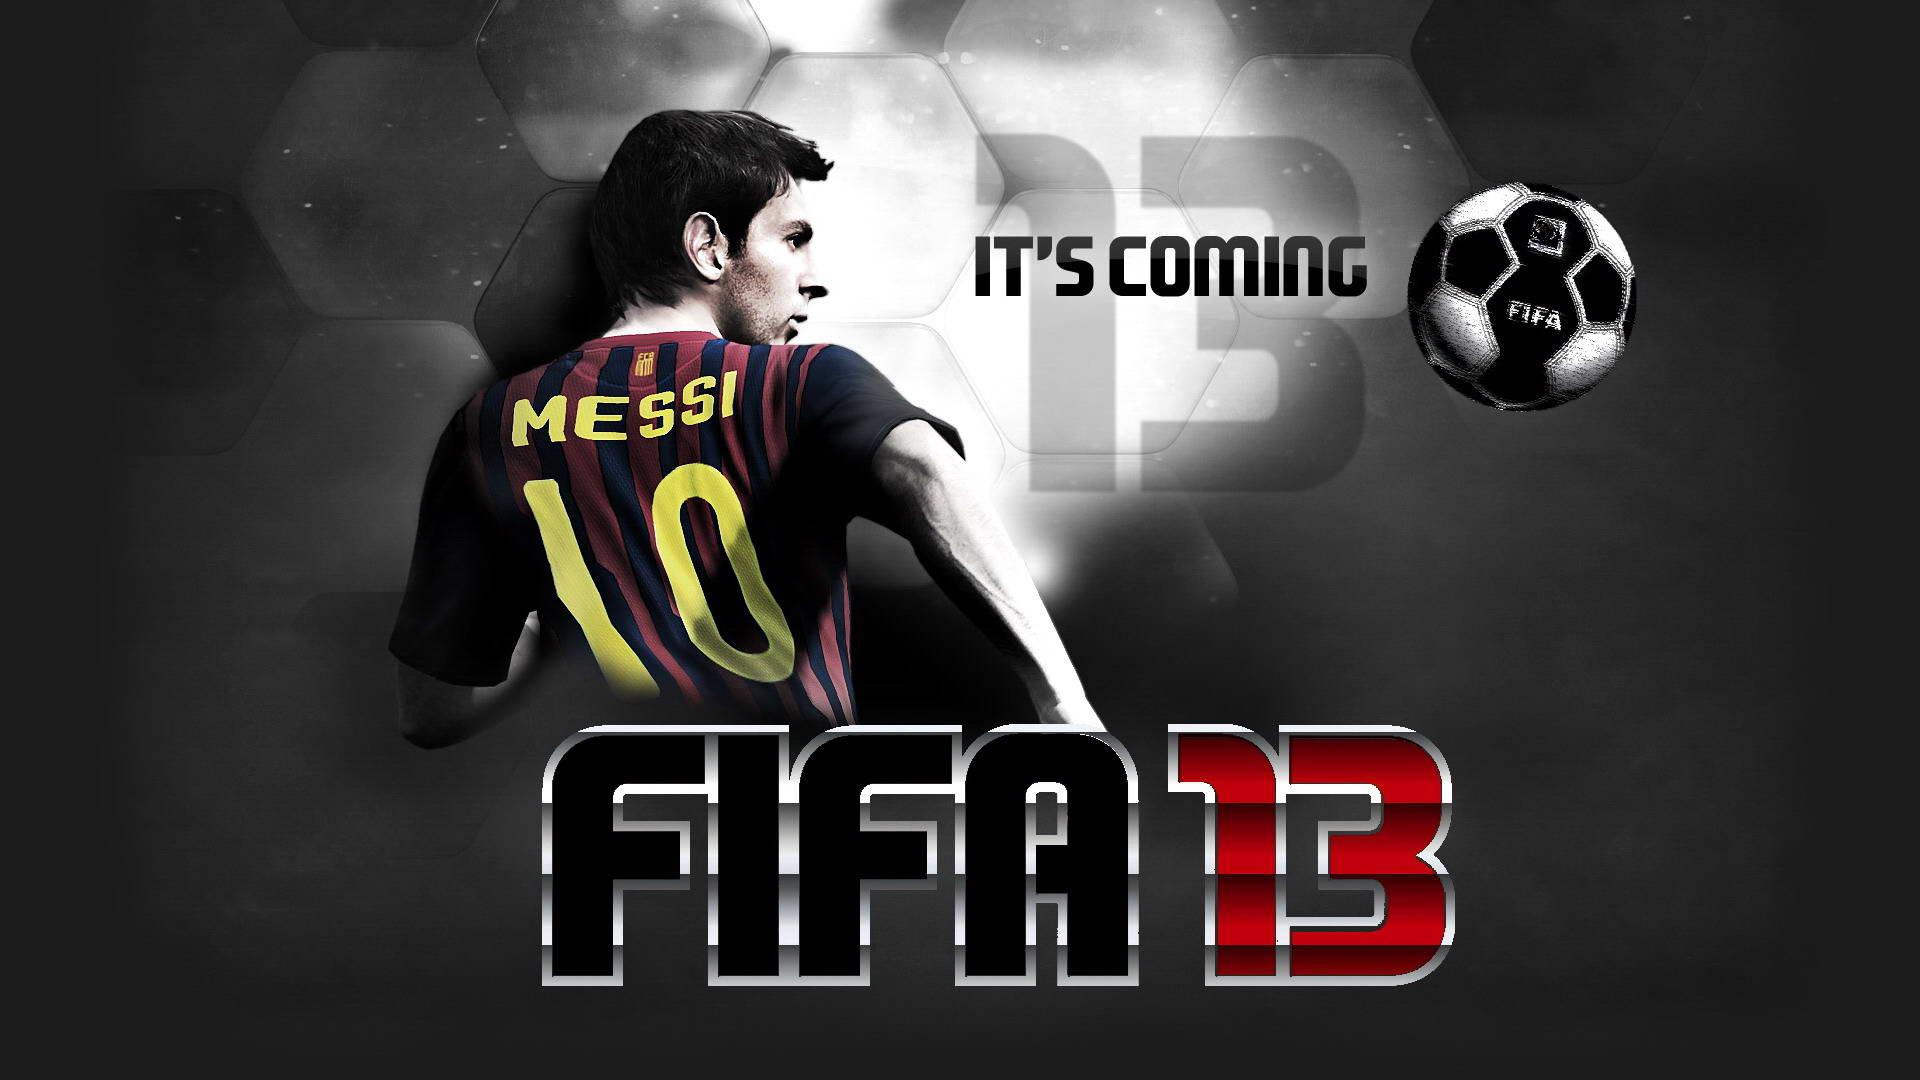 《fifa 13》游戏壁纸(1)